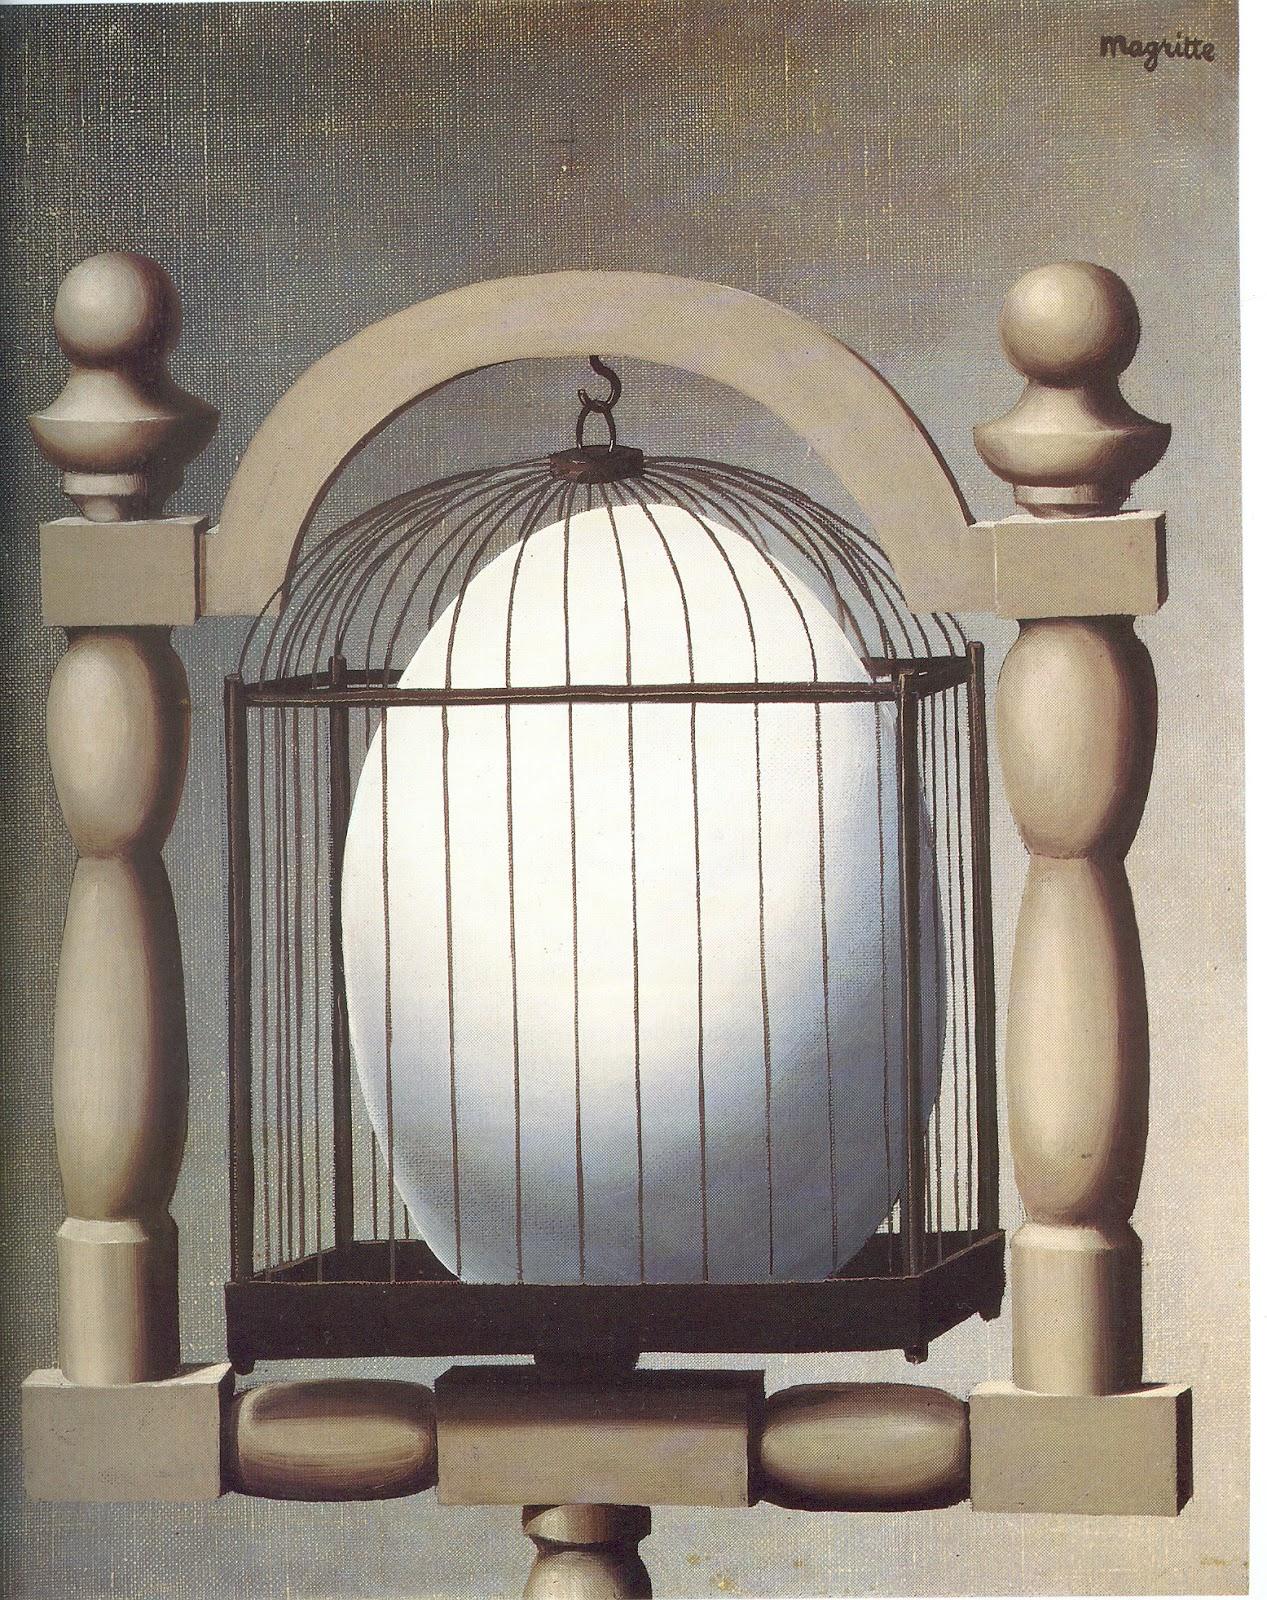 Elective Affinities - René Magritte